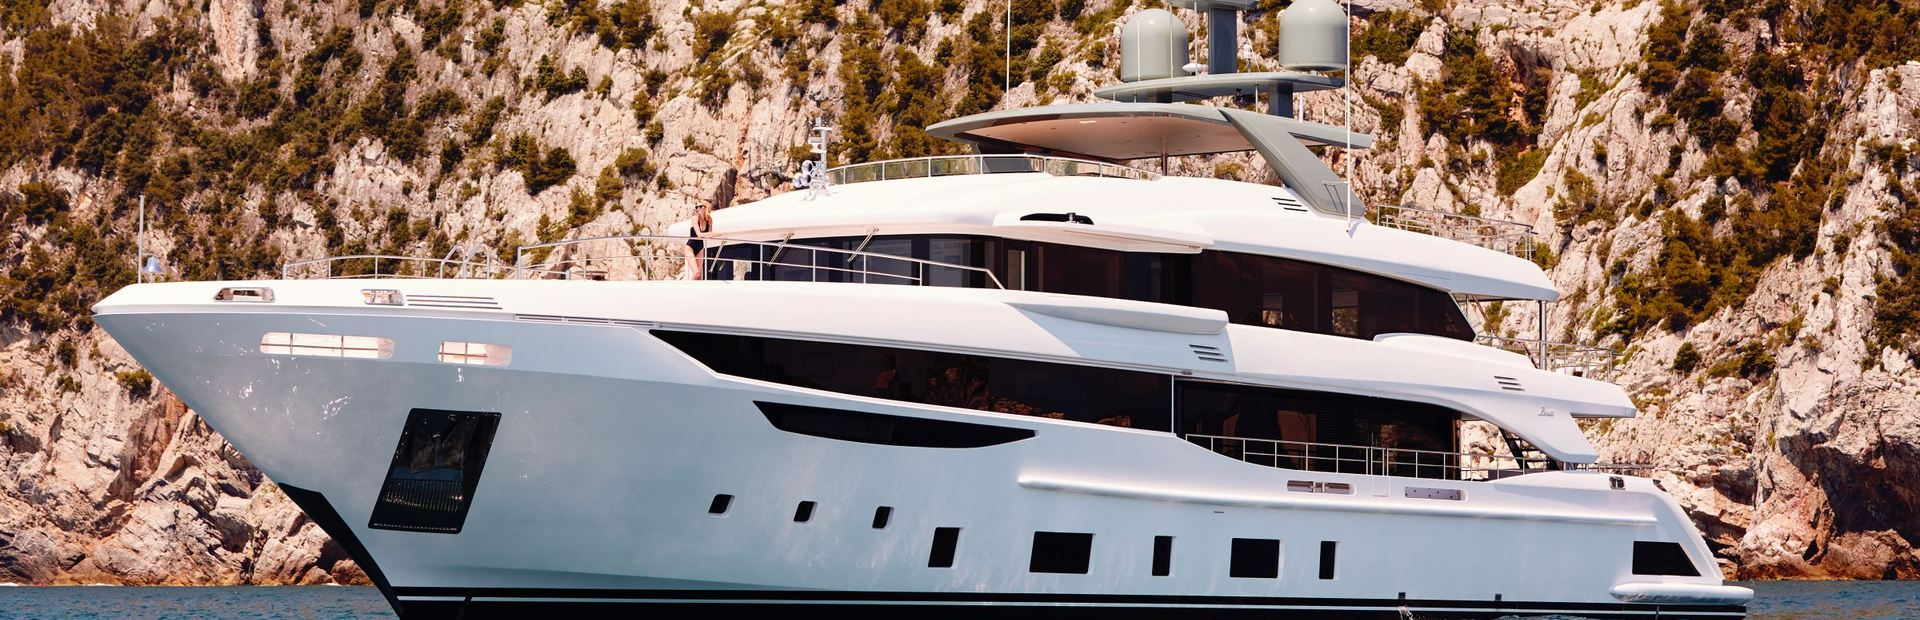 Diamond 145 Yacht Charter